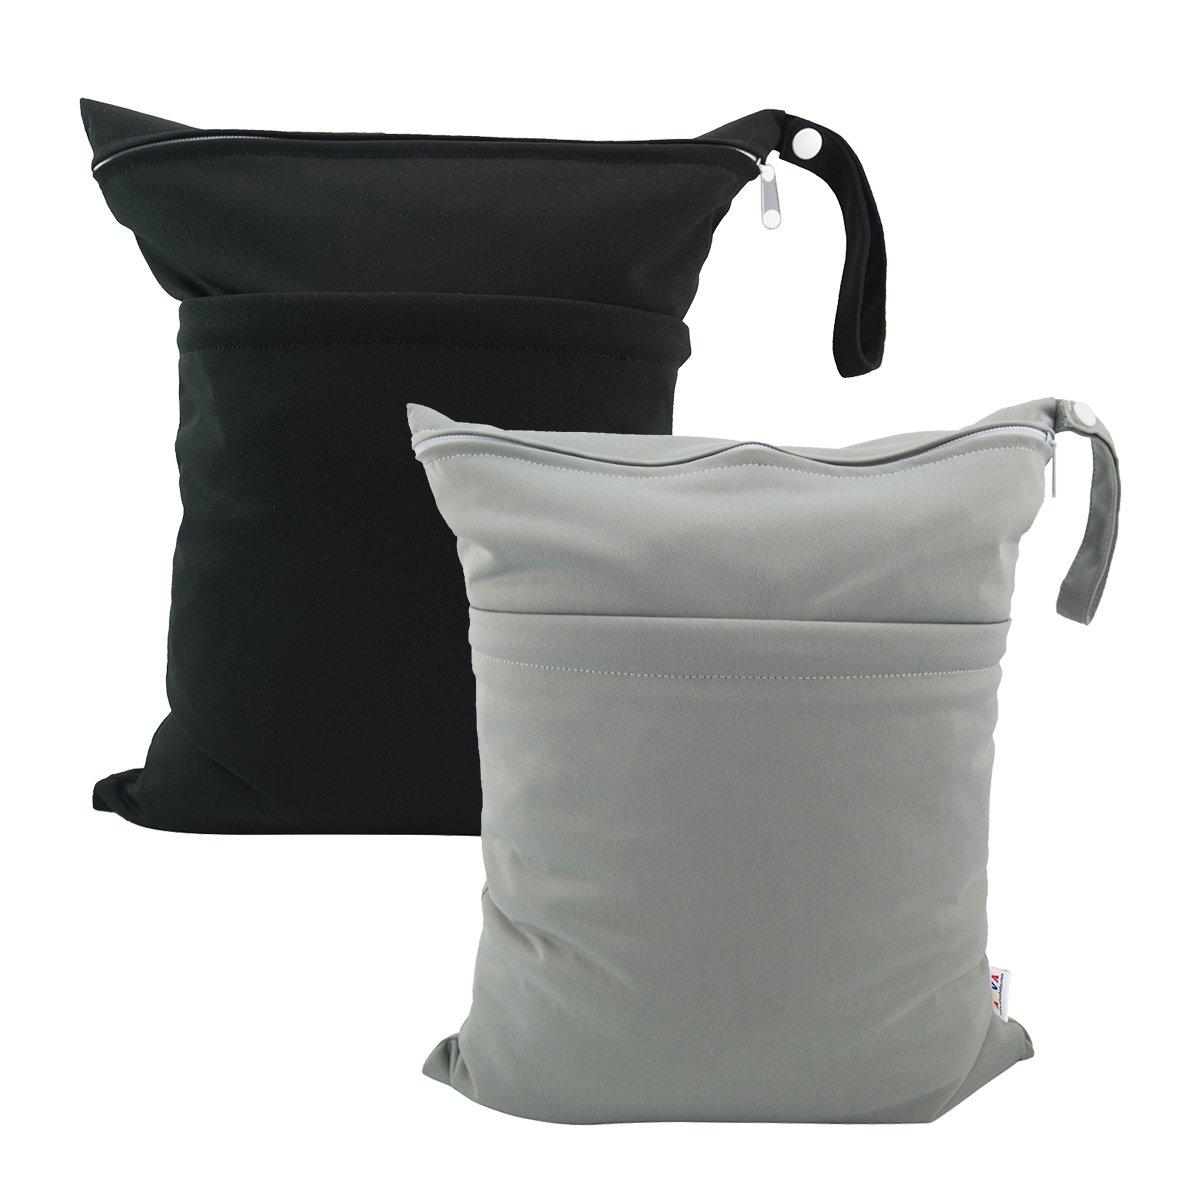 Amazon.com : Wet Bags, Angel Love 2 Pack Baby Cloth Diaper